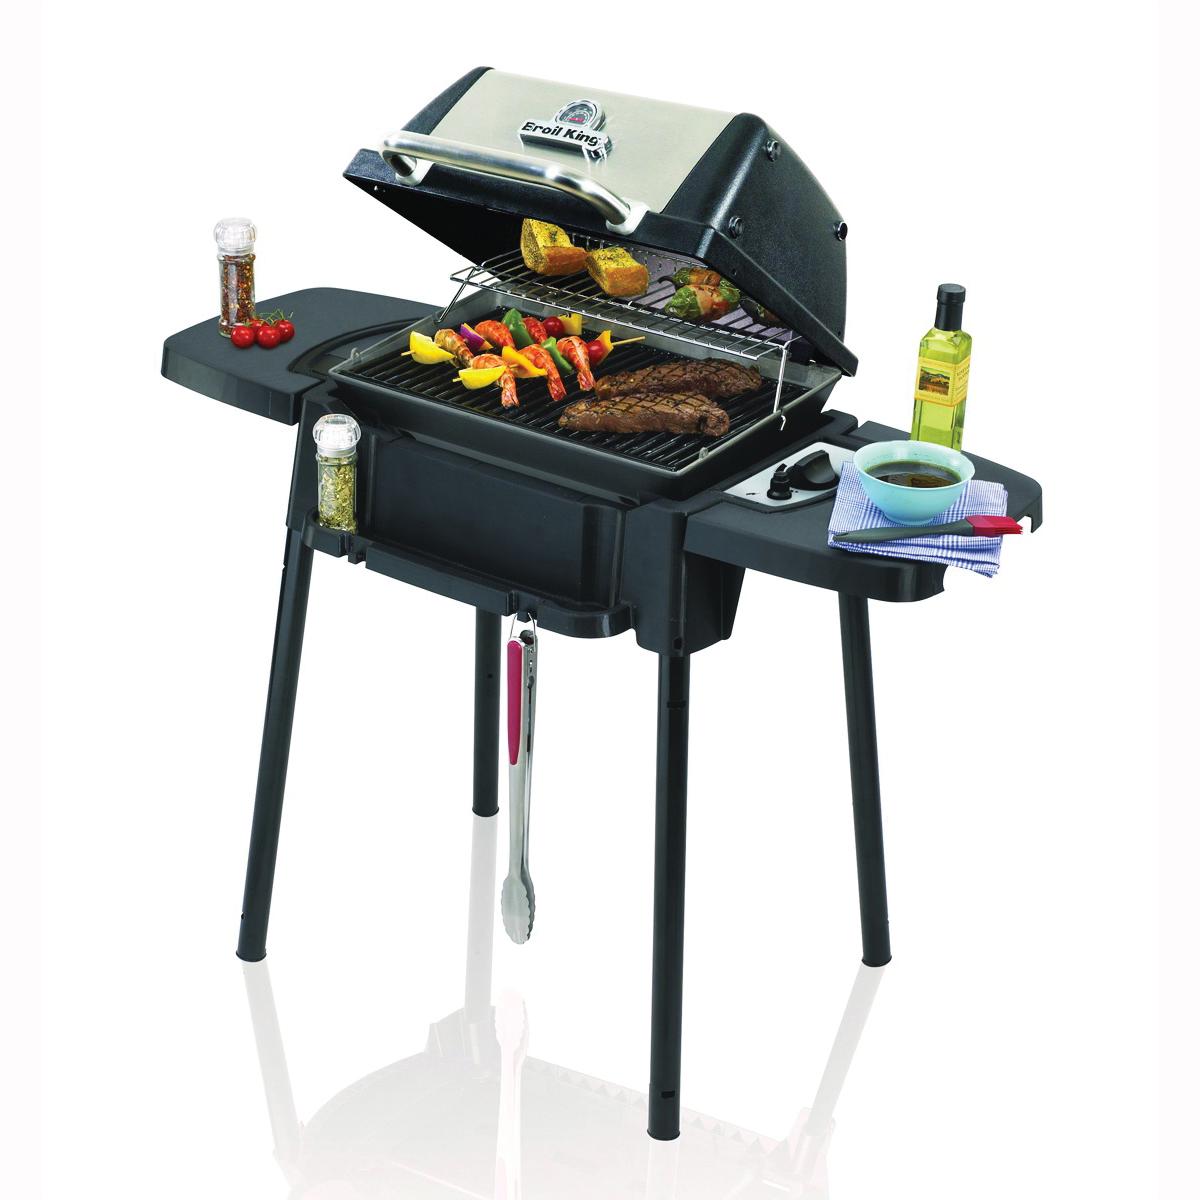 Picture of Broil King Porta-Chef 950654 Gas Grill, 14000 Btu/hr BTU, Liquid Propane, 1 -Burner, Stainless Steel Body, Black